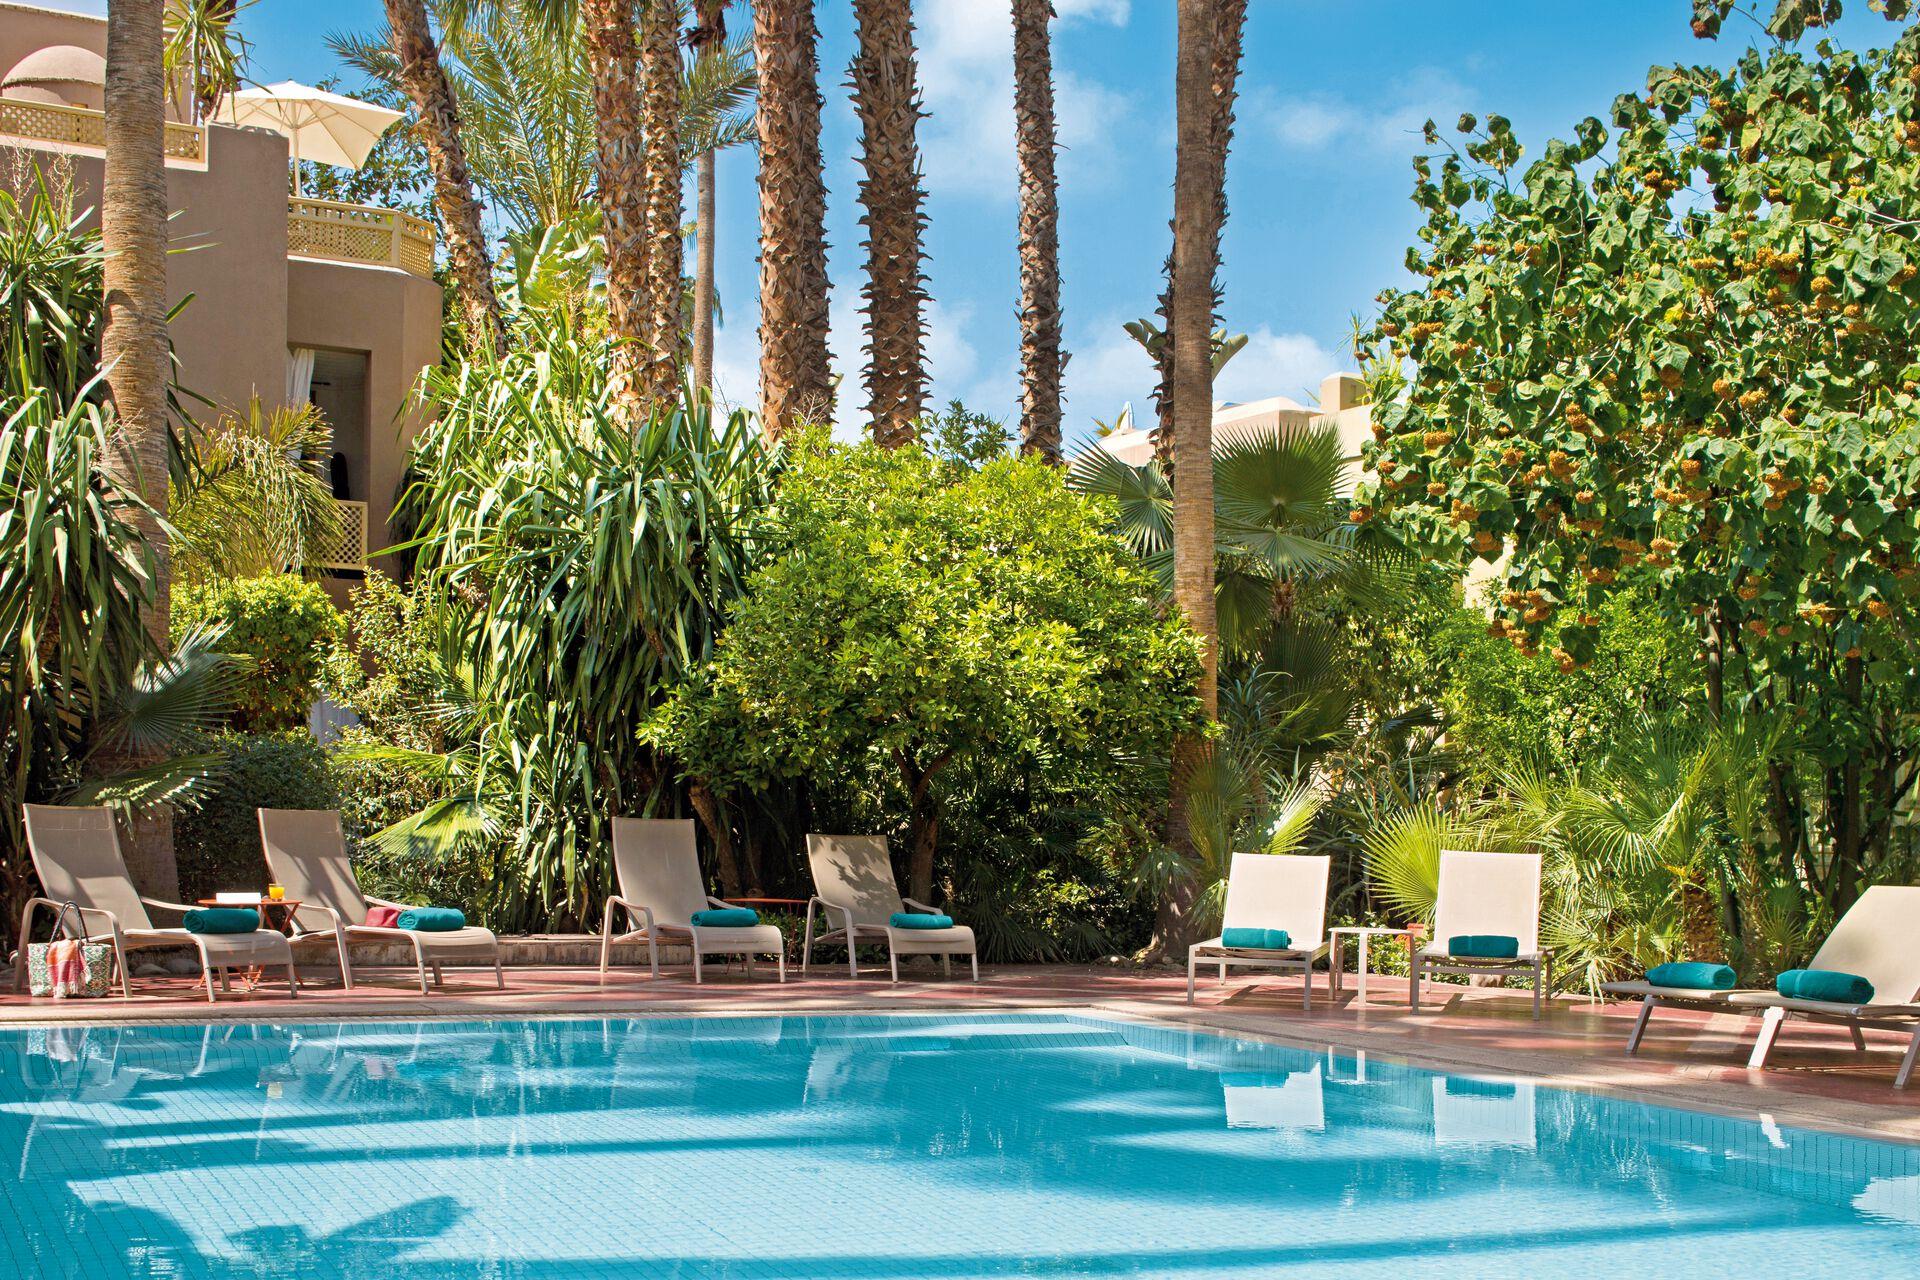 Séjour Marrakech - Les Jardins de la Medina - 0*